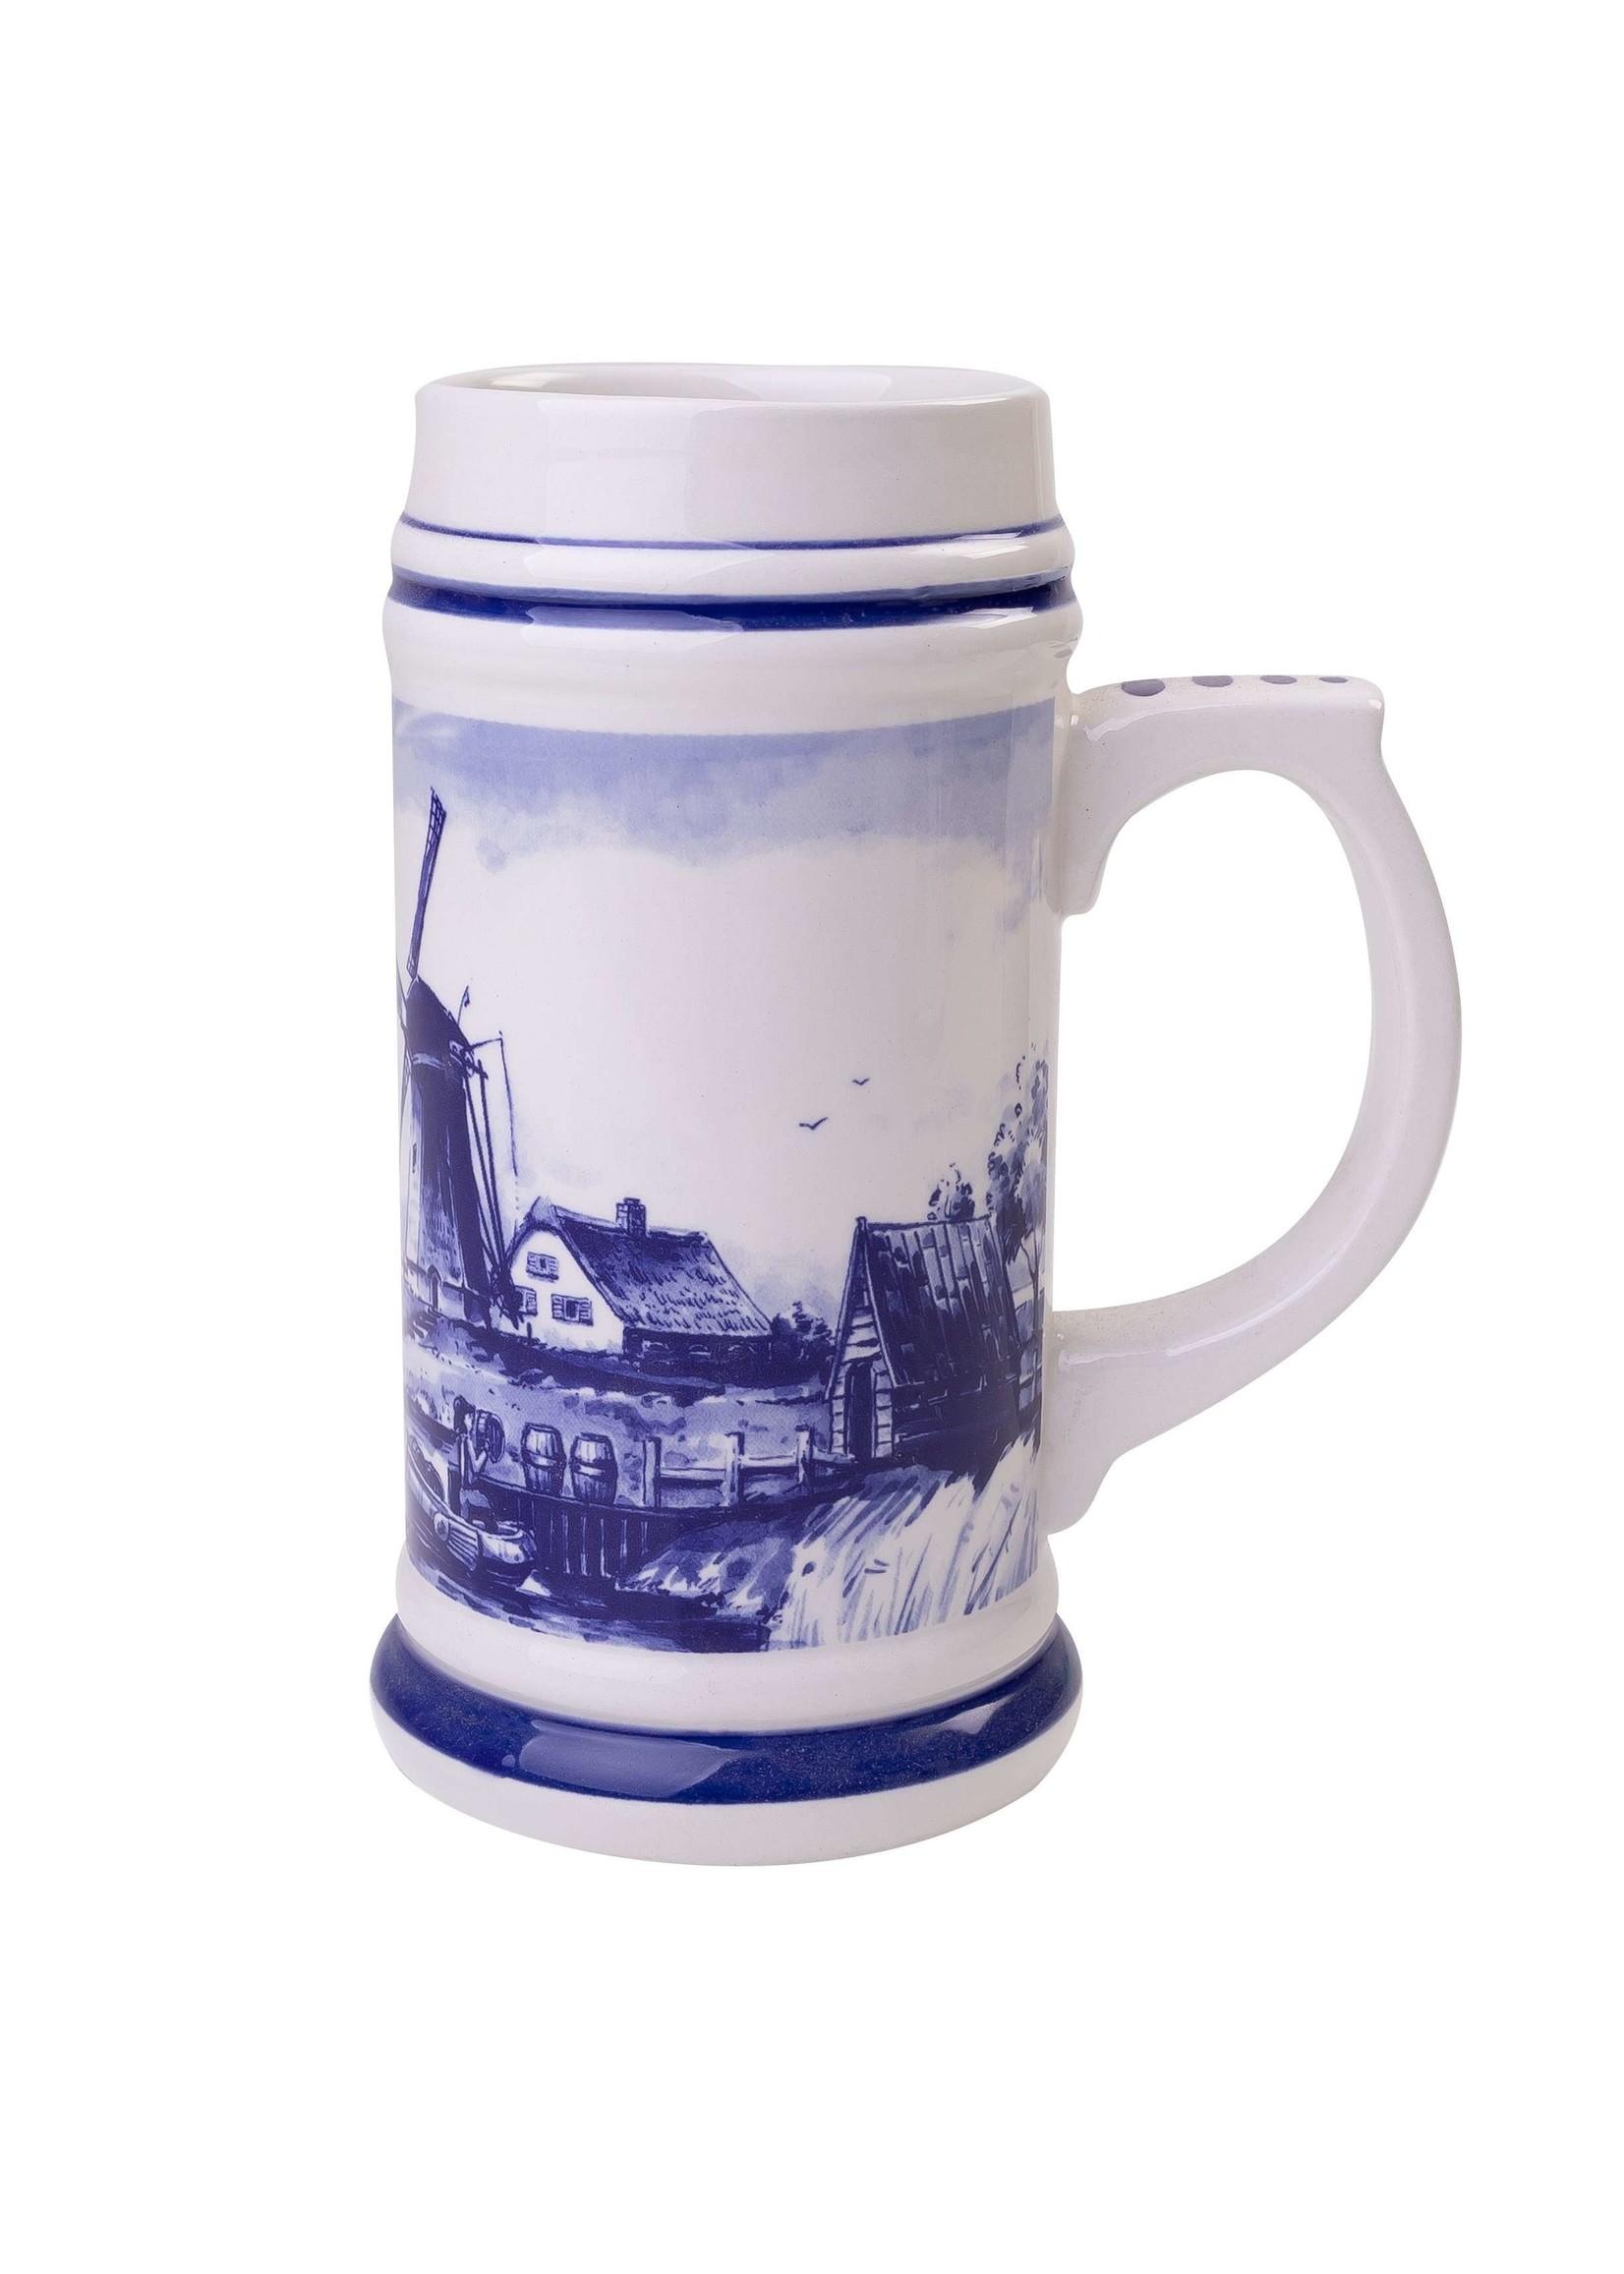 Delft Blue Beer Mug with a Typical Dutch Landscape, 350 ml 11,8 oz